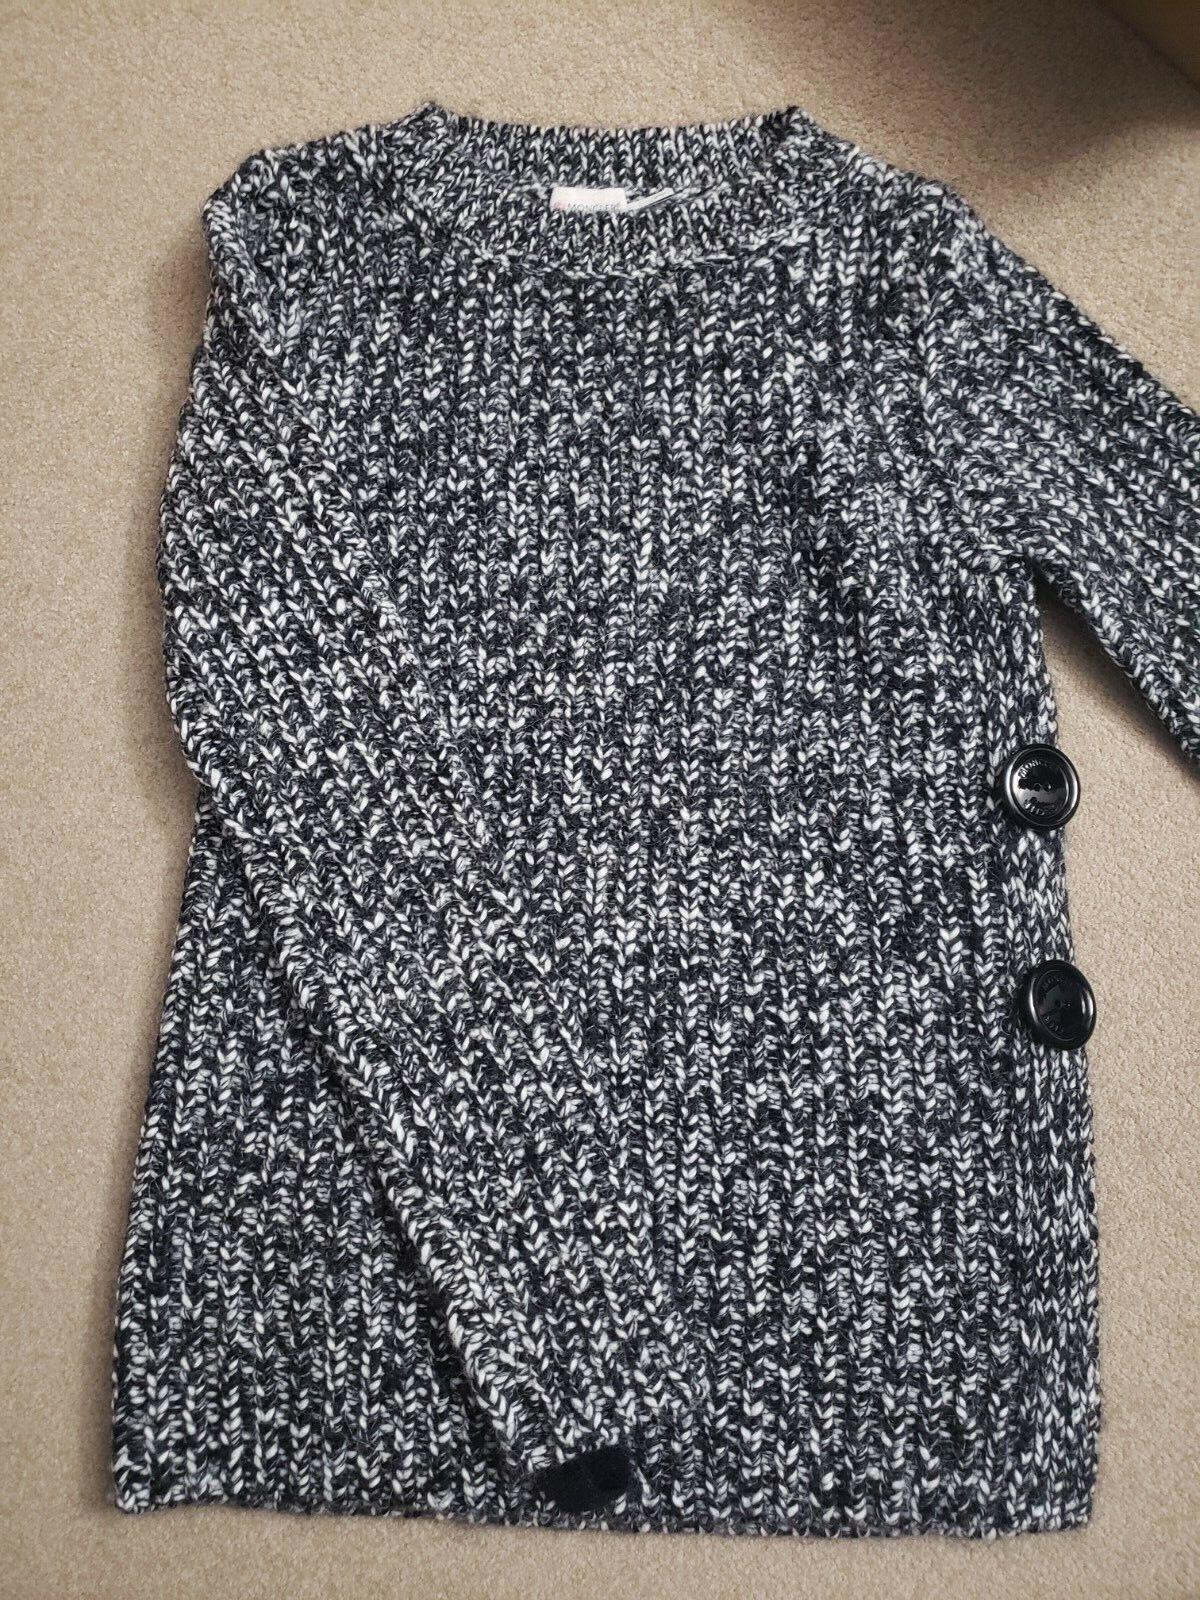 NWT Moncler damen Sweater Größe M MSRP 605